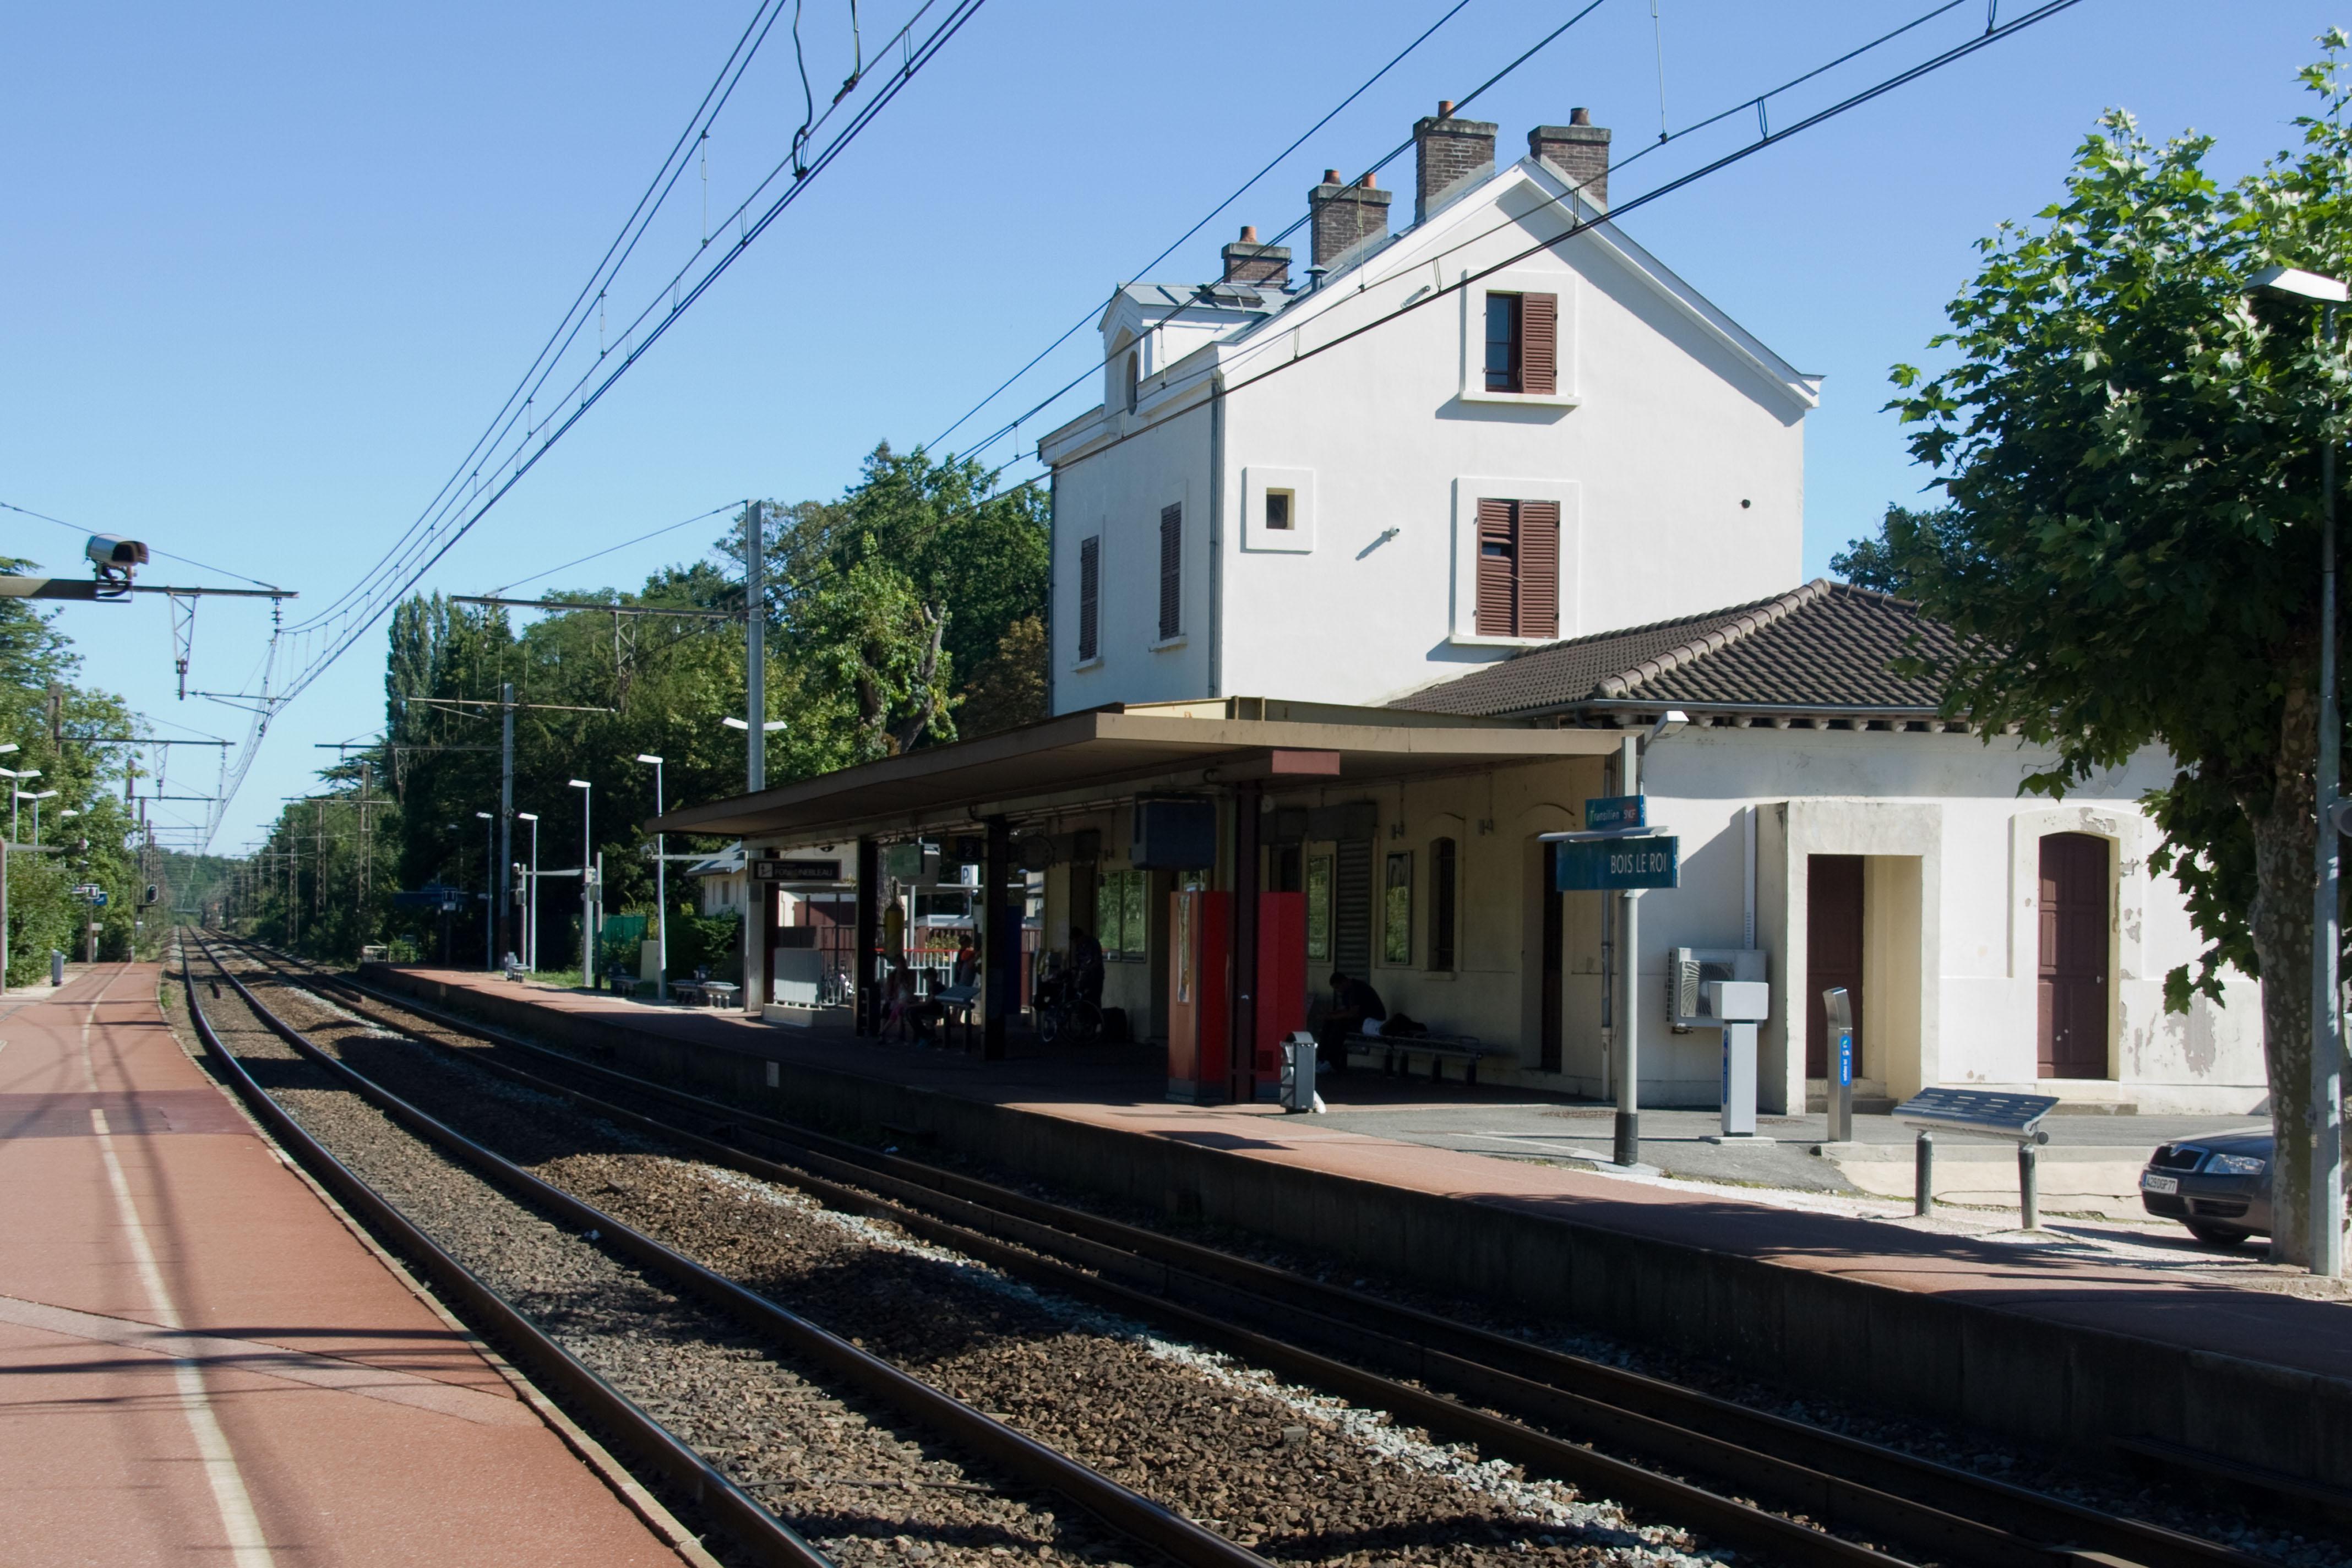 Triathlon Bois Le Roi - File Gare de Bois le Roi IMG 8426 jpg Wikimedia Commons